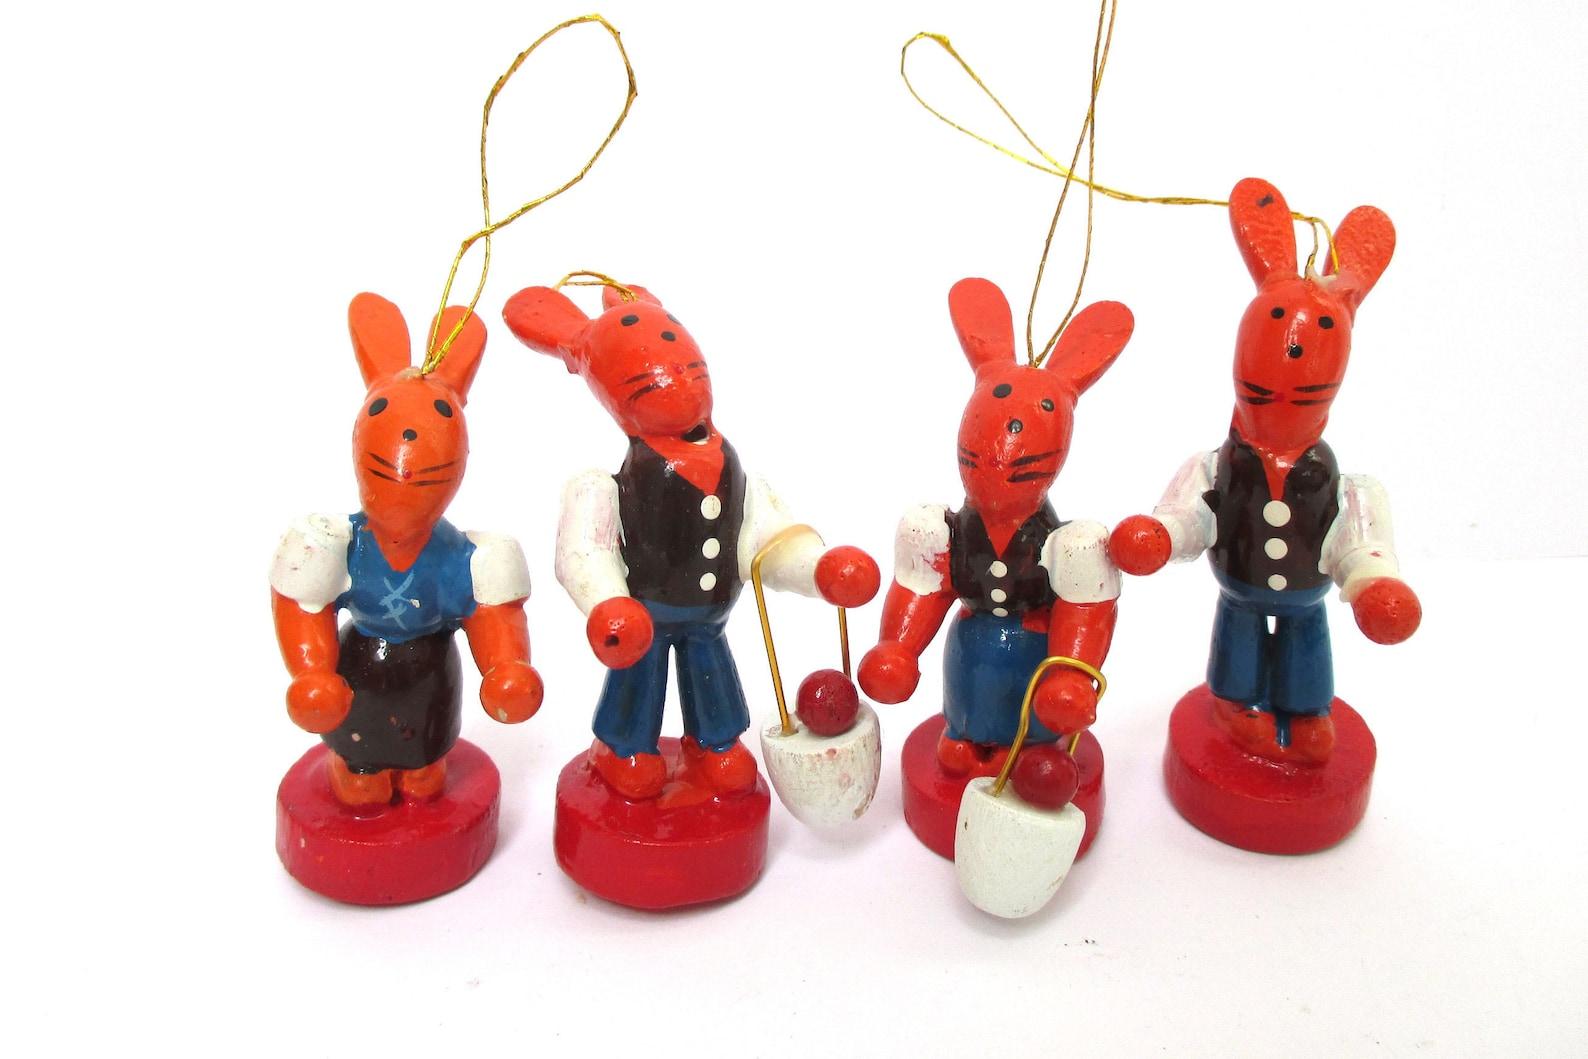 Wood Easter Bunny Ornaments Four Erzgebirge Bunnies Spring Decor German Wood Ornaments Set Rabbits Handmade Wood Red Blue Rabbits